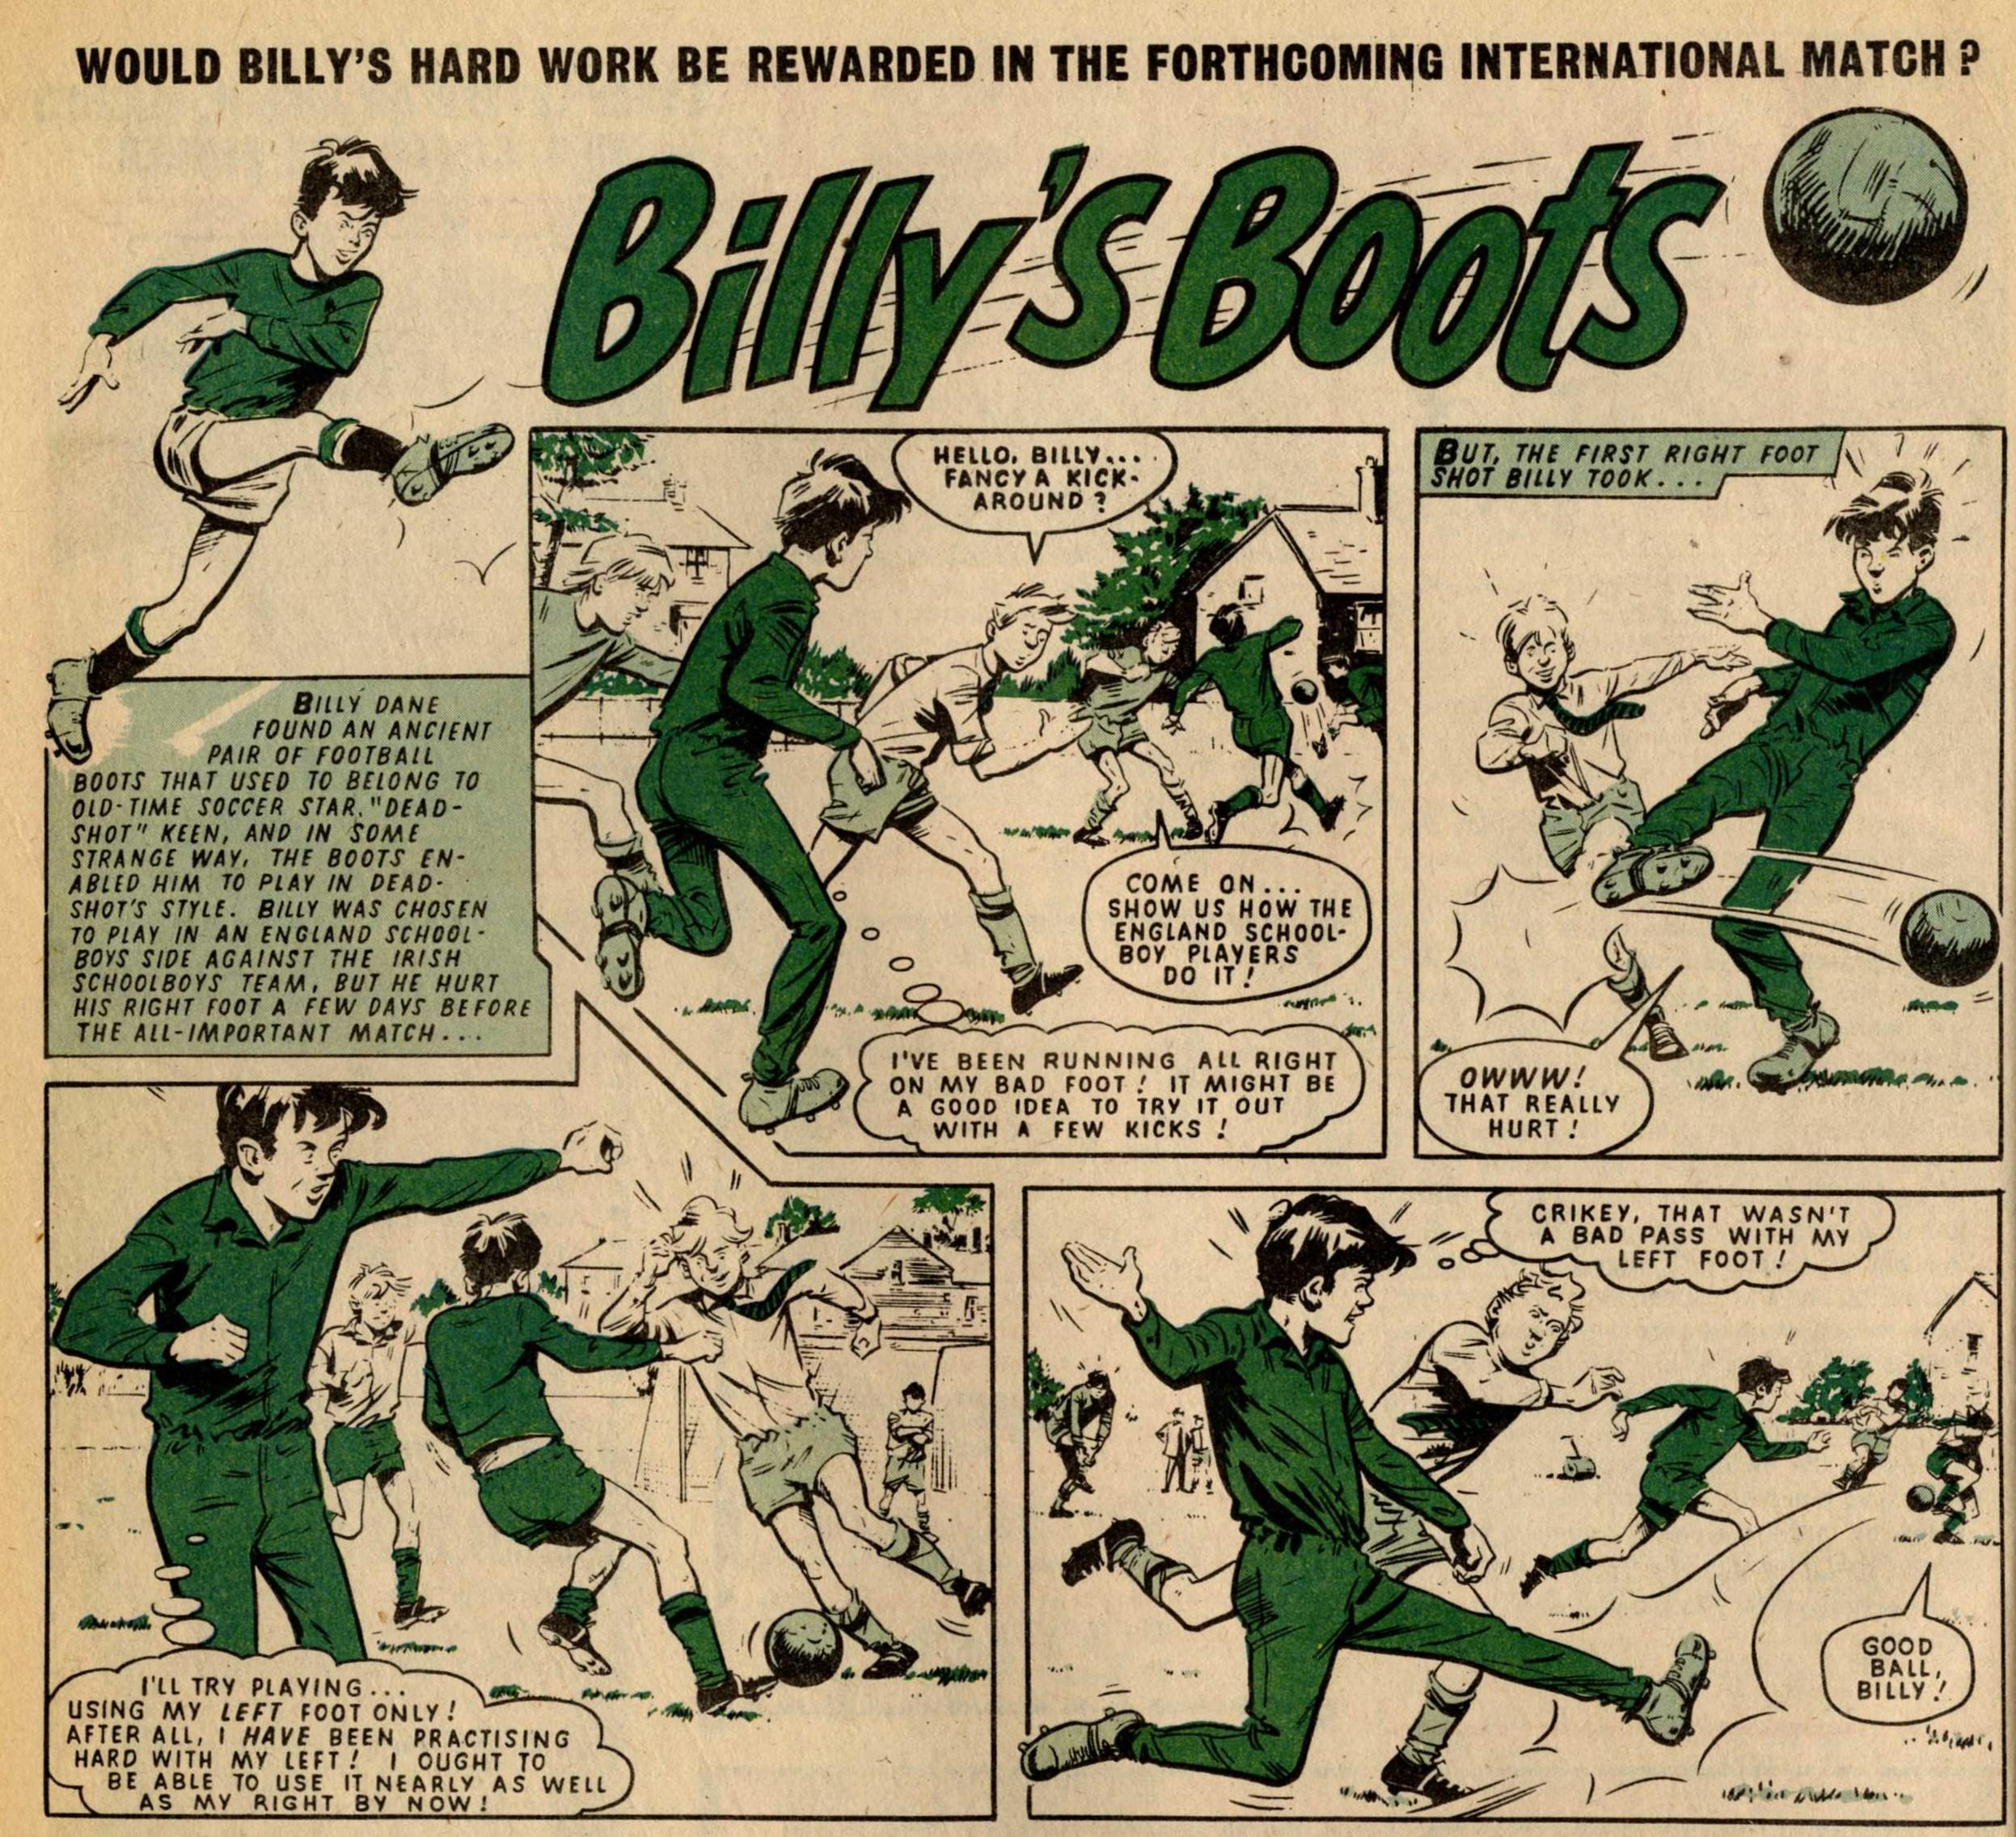 Billy's Boots: Fred Baker (writer), Tom Kerr? (artist)